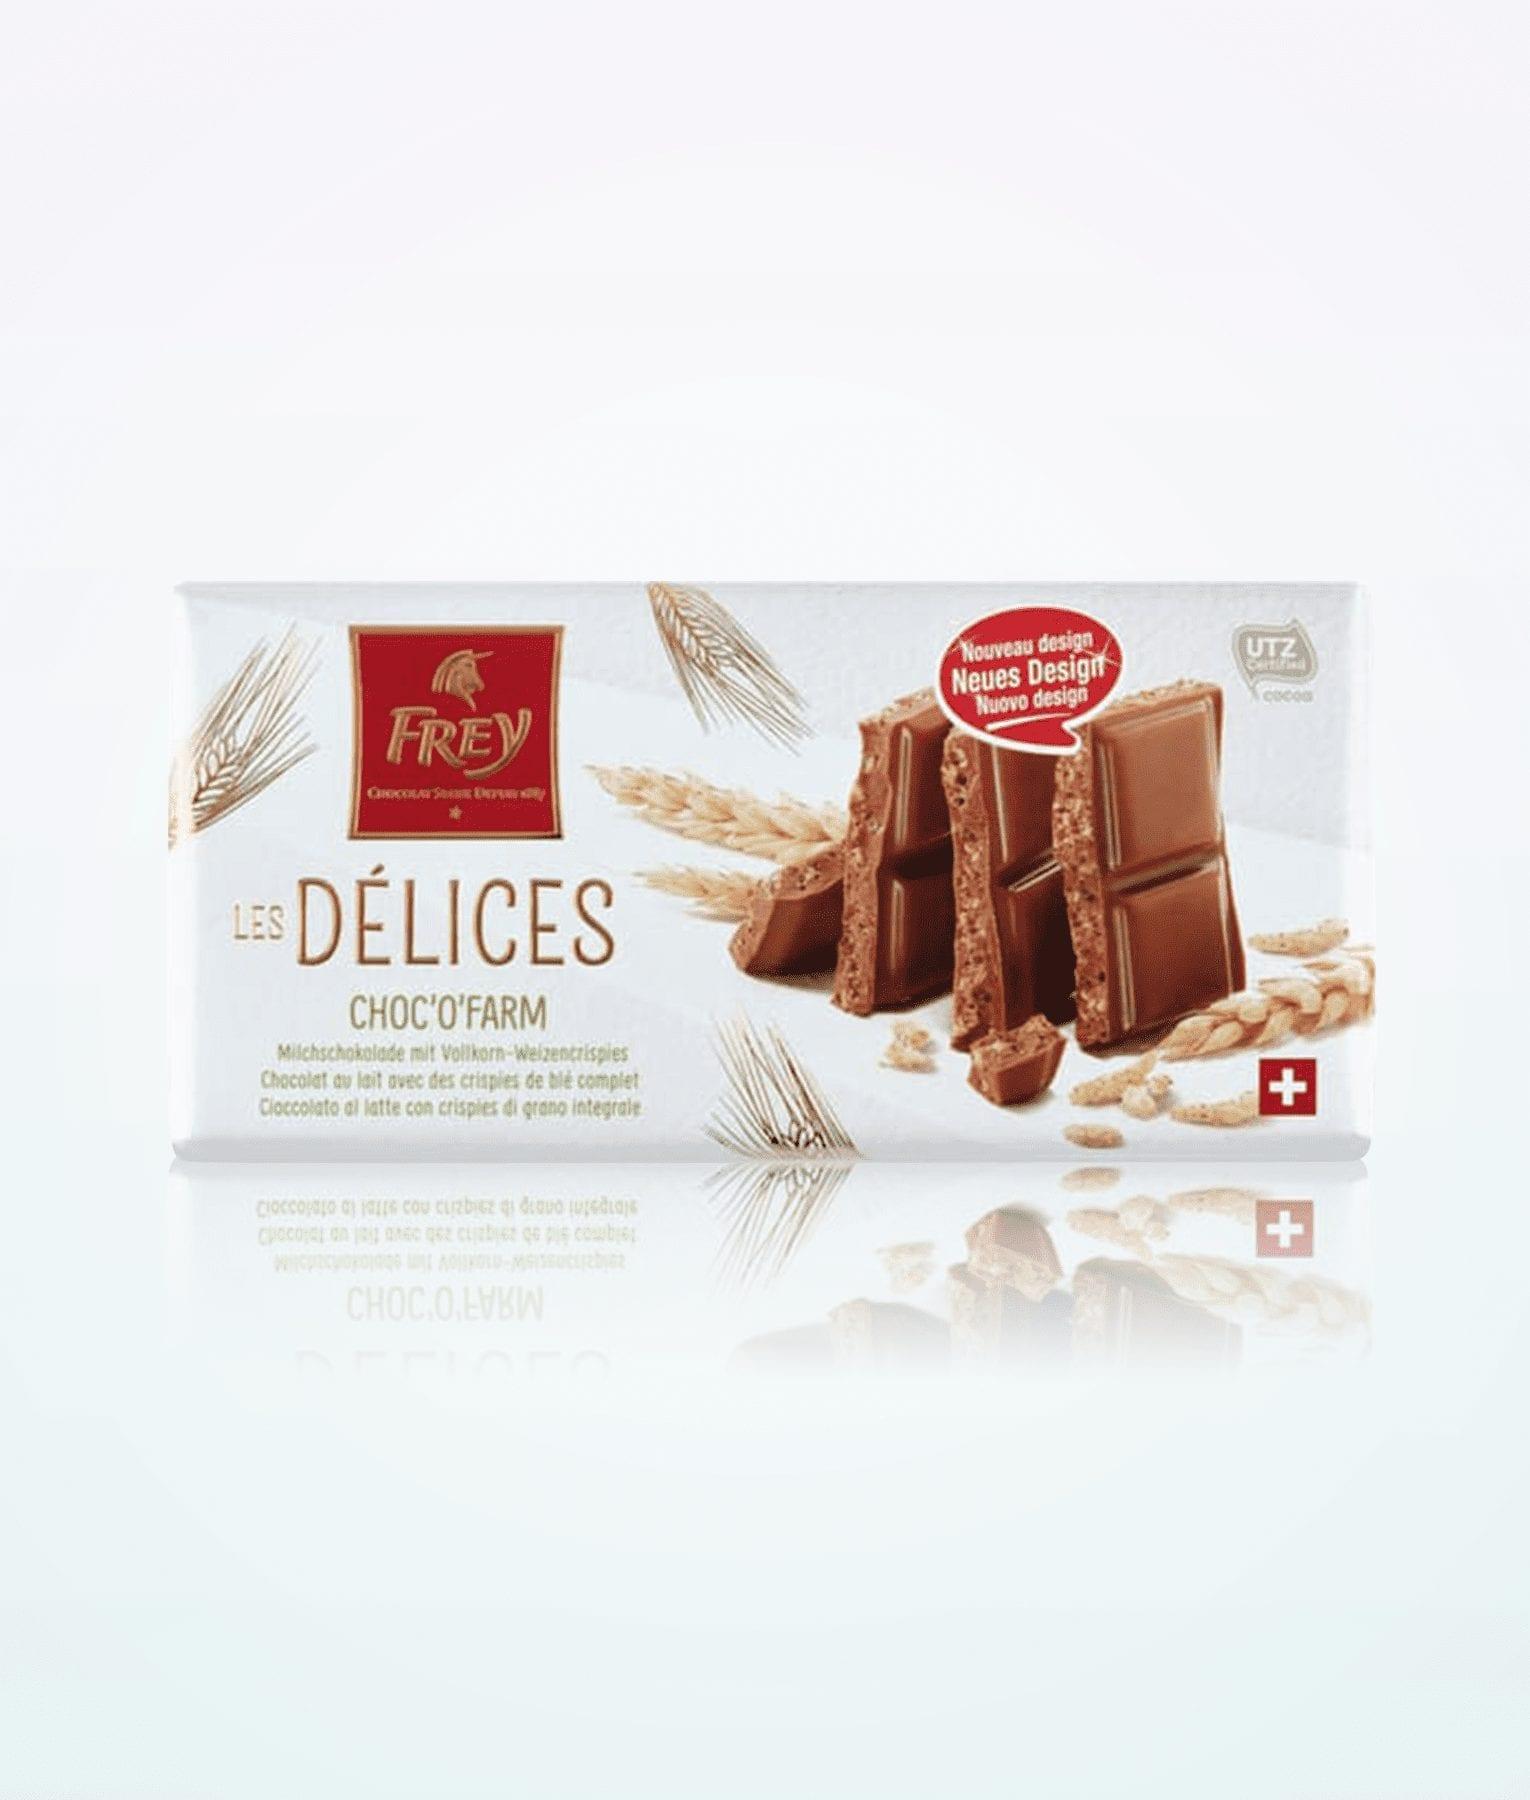 frey-les-delices-farm-milk-chocolate-100g